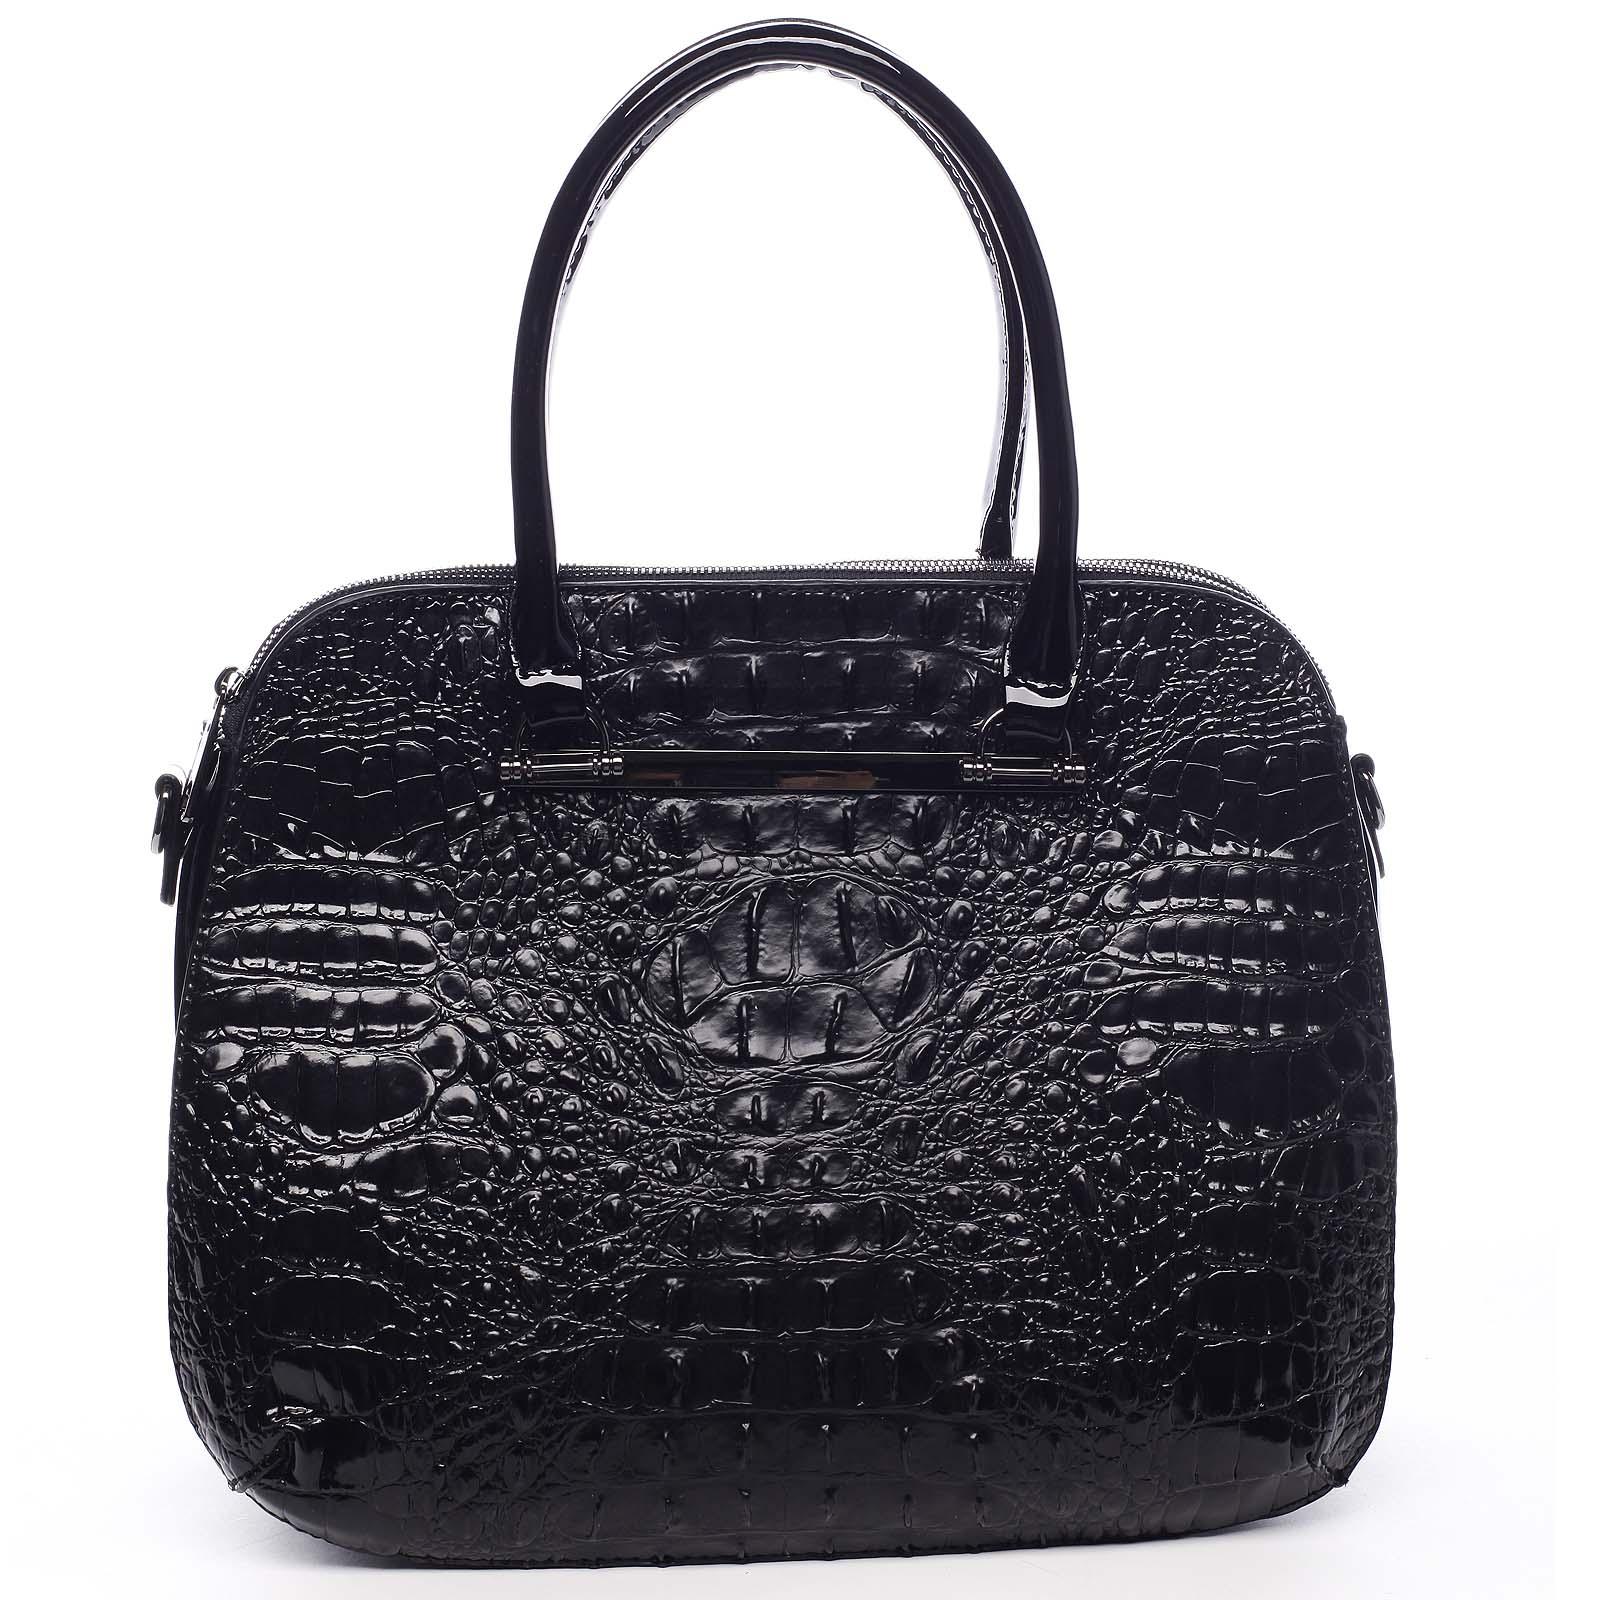 Dámska kabelka do ruky čierna - Dudlin Lexi